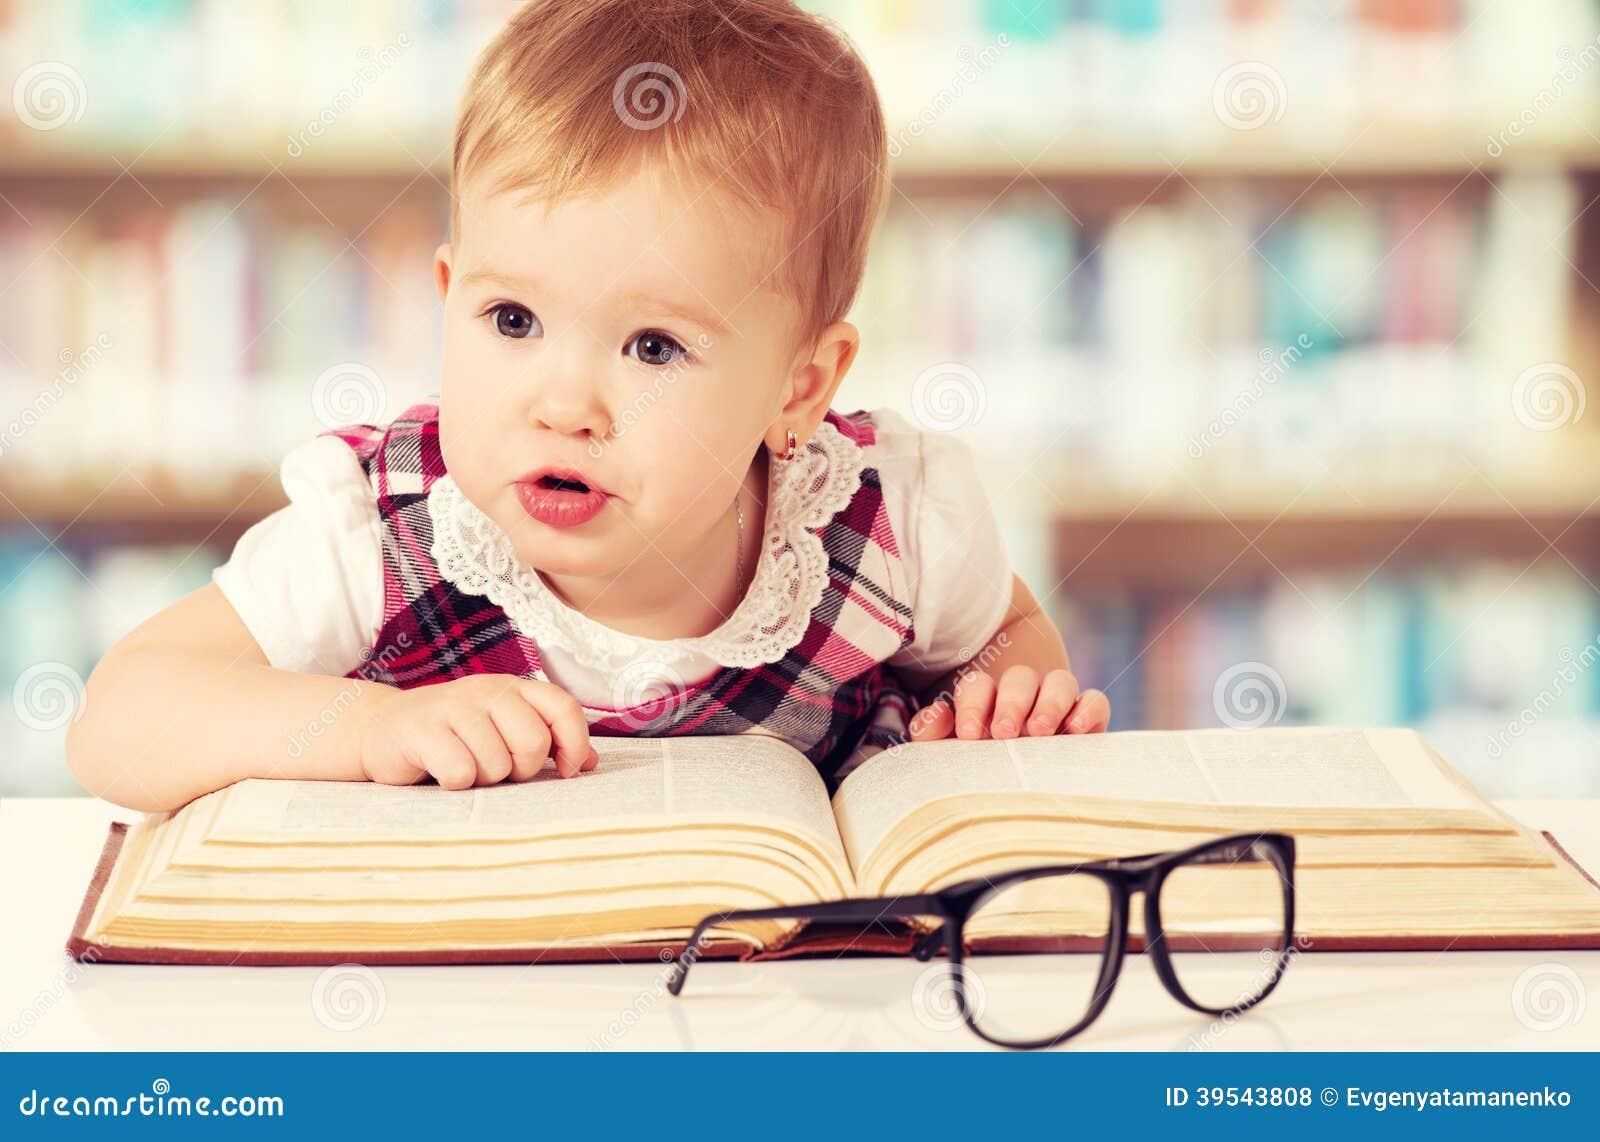 Meet Kate Hudson on the Pretty Happy Book Tour - The ... |Pretty Happy Book